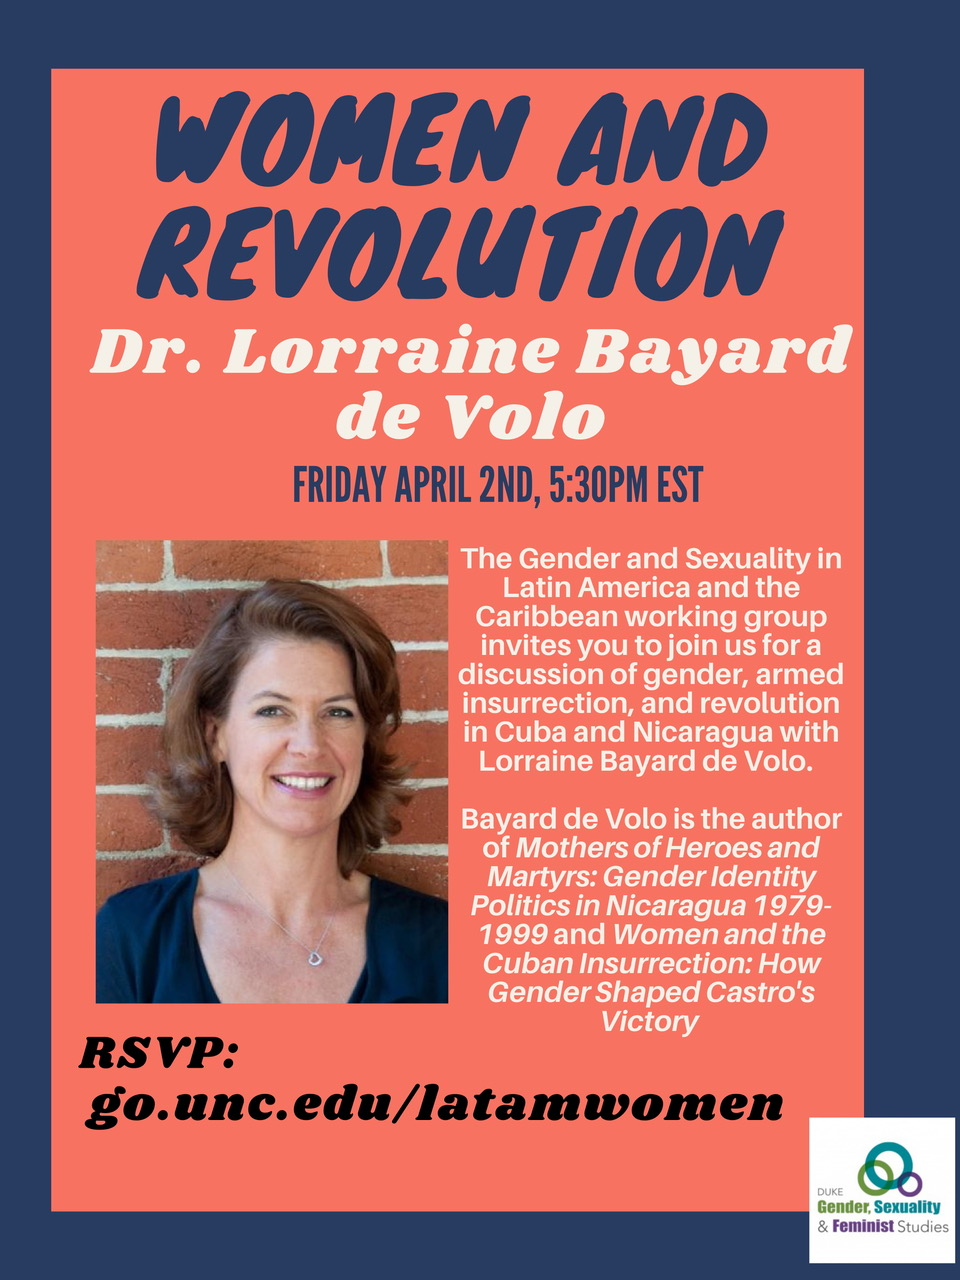 Dr. Lorraine Bayard de Volo on Women and Revolution